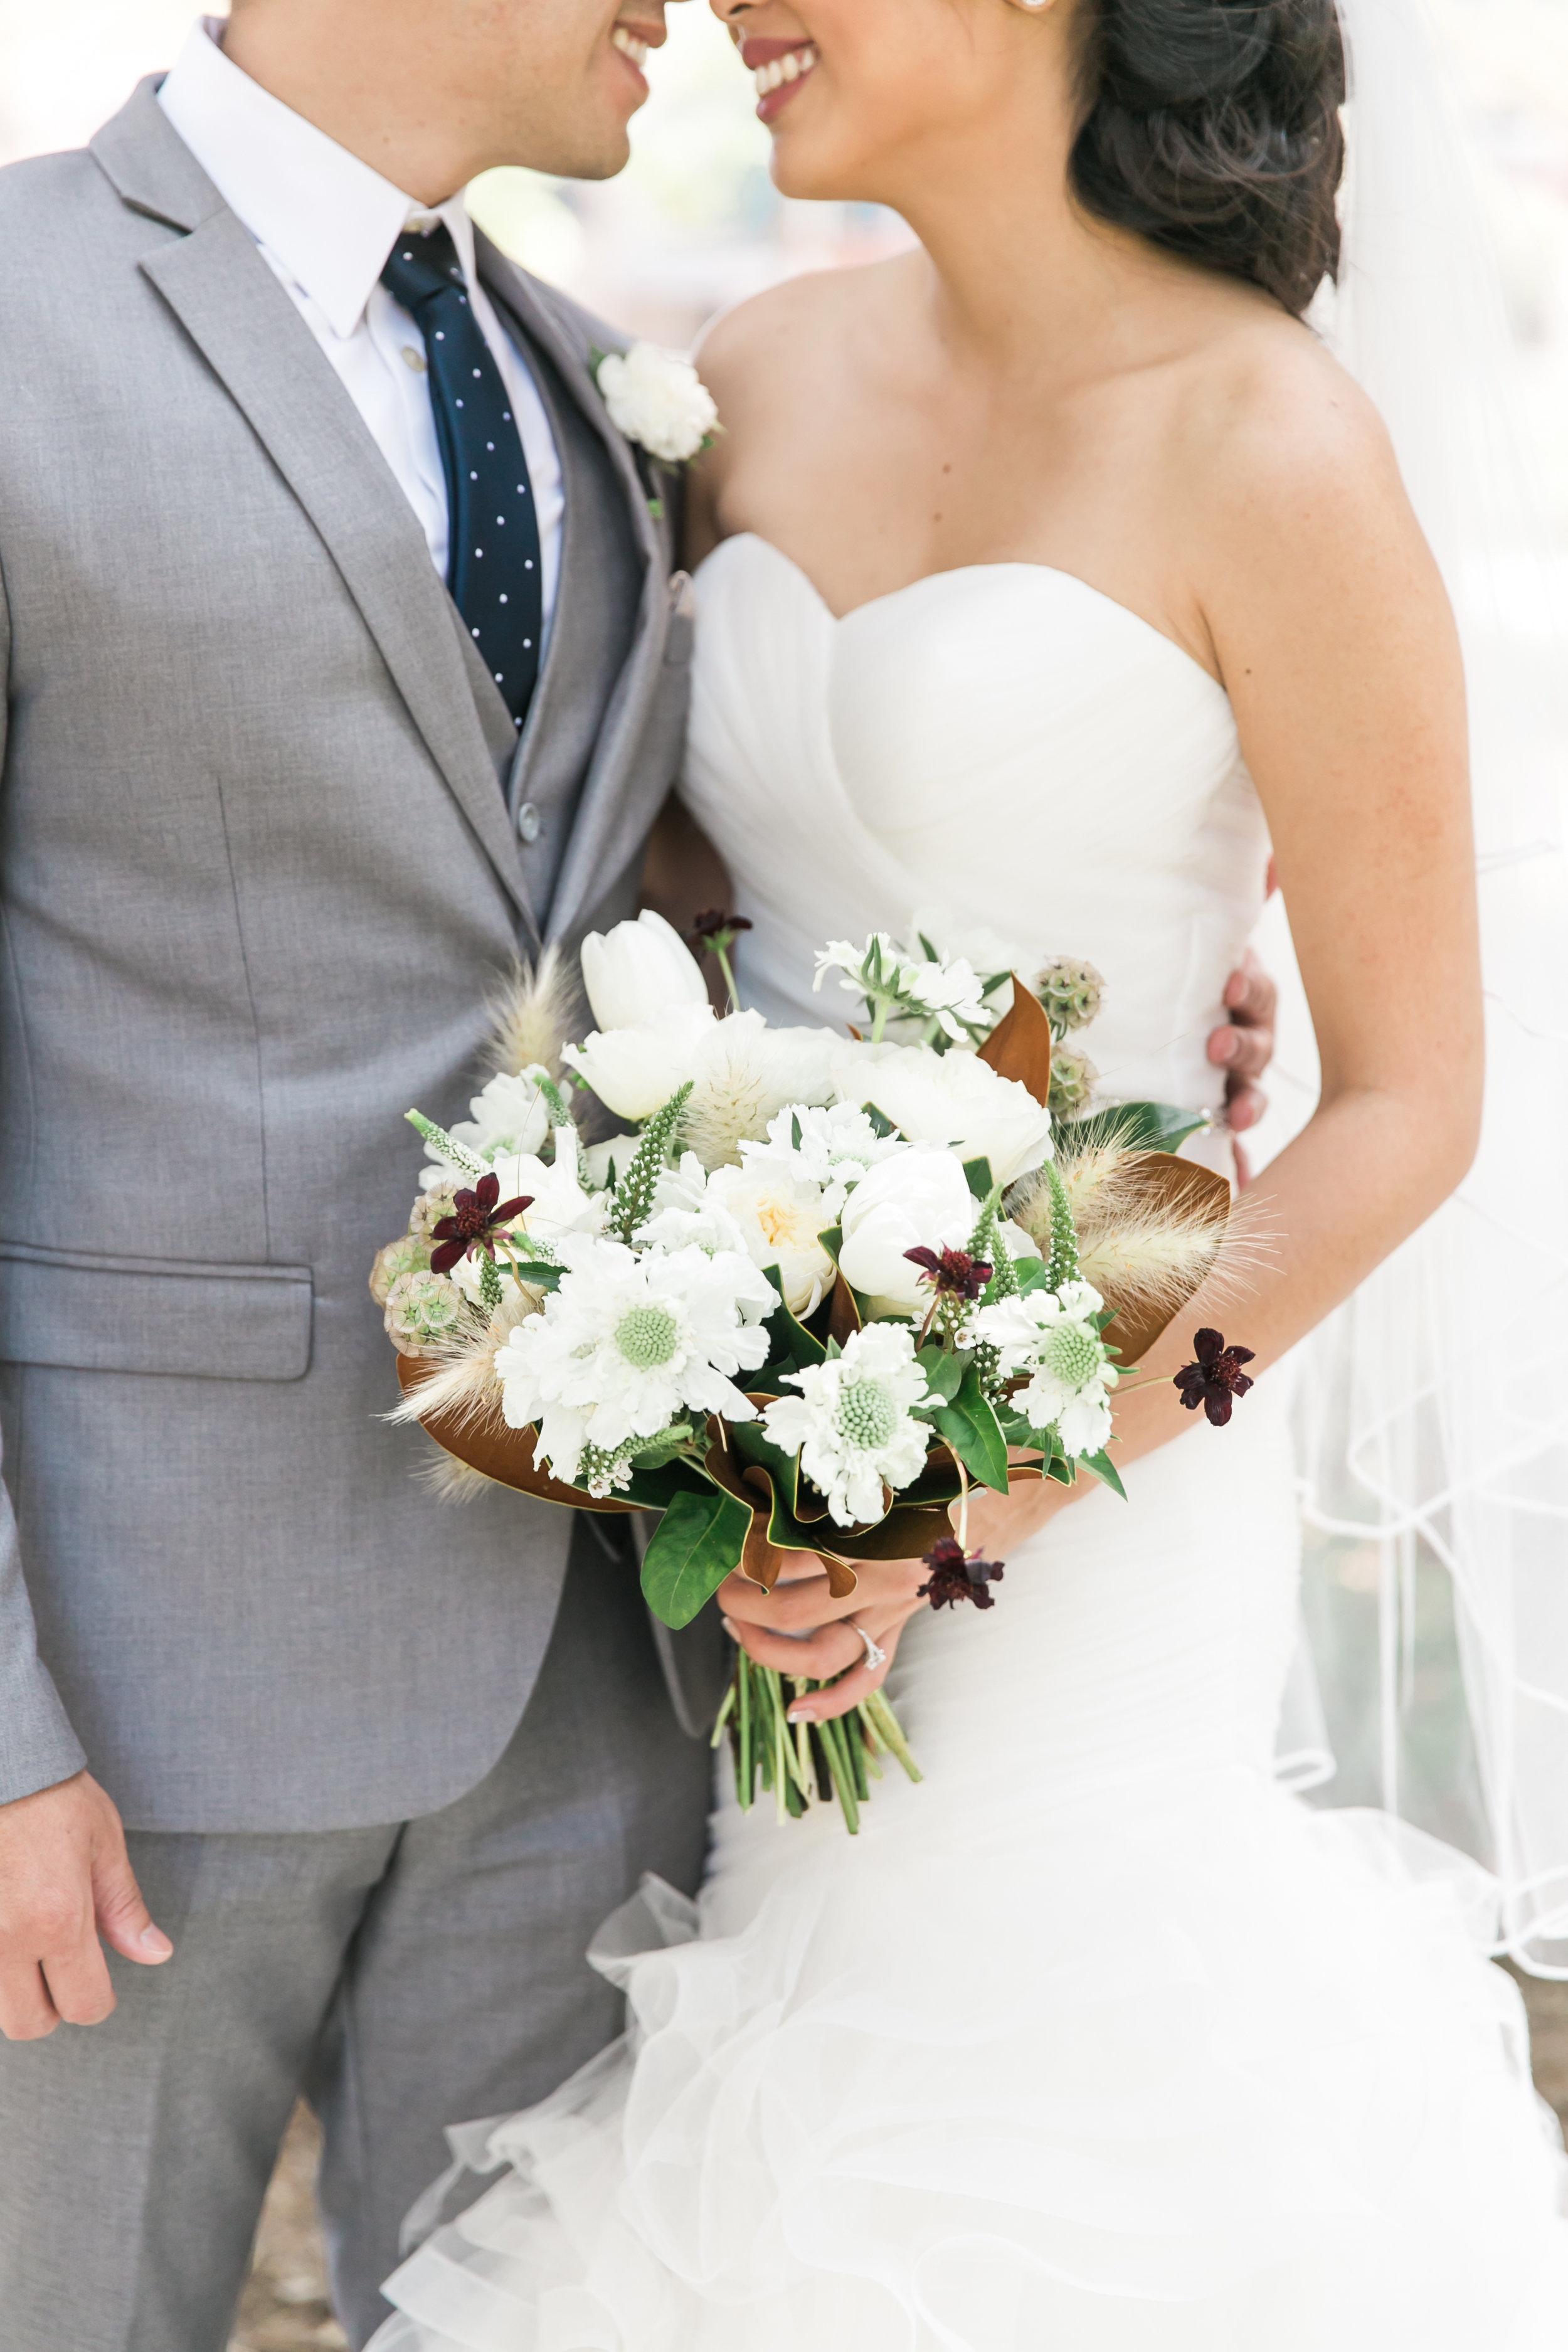 Frank&Melissa'swedding-24.jpg